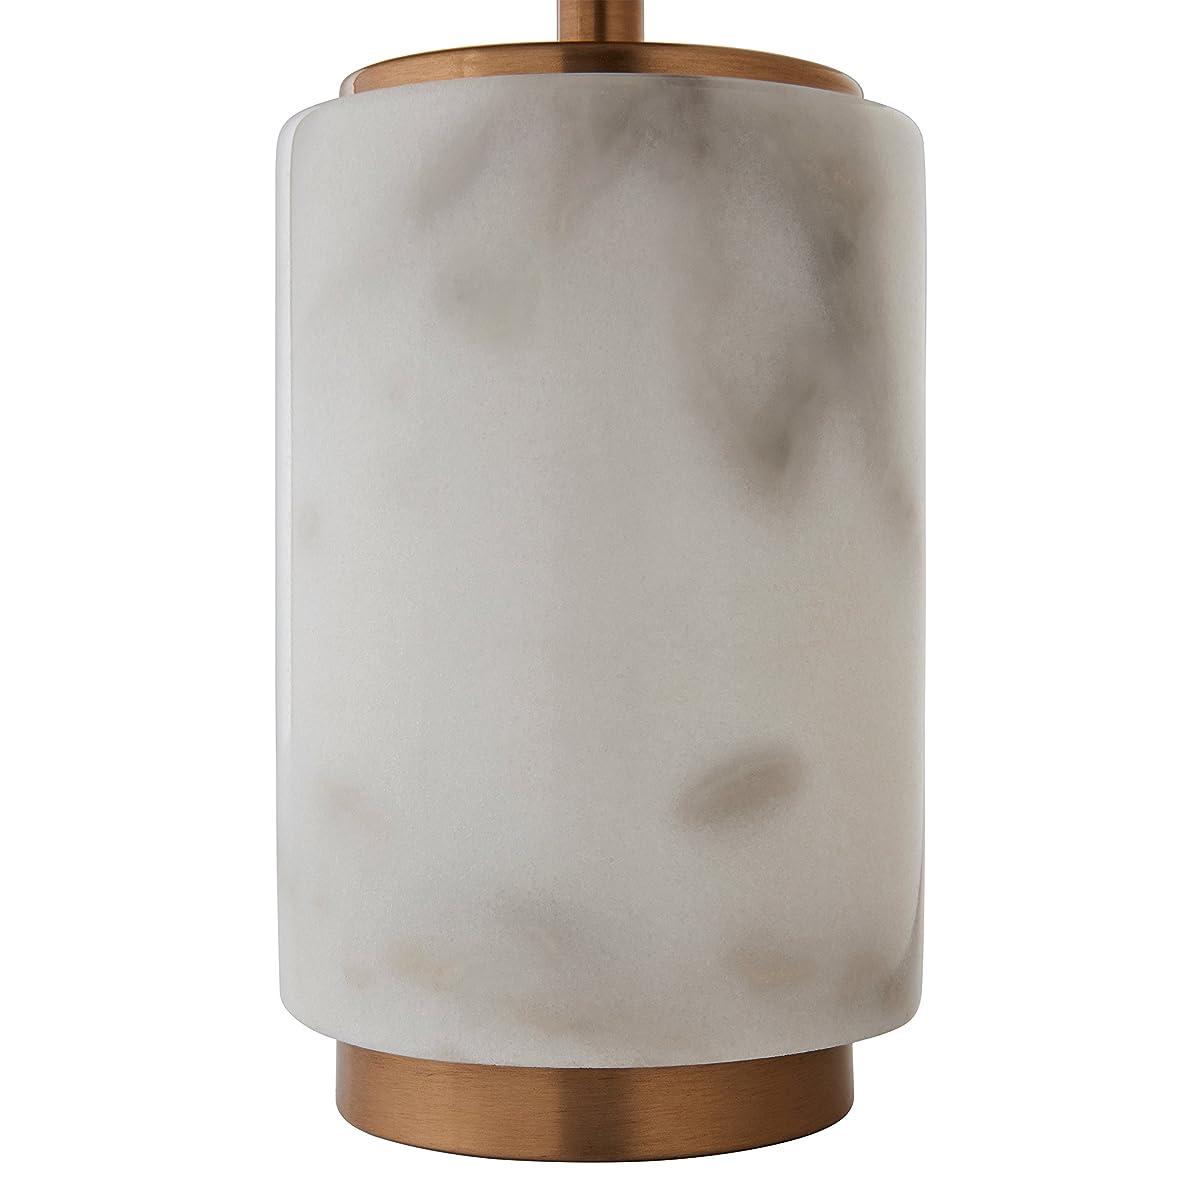 "Rivet Modern Marble Mini Lamp With Bulb, 14"" H, White Marble, Brass"